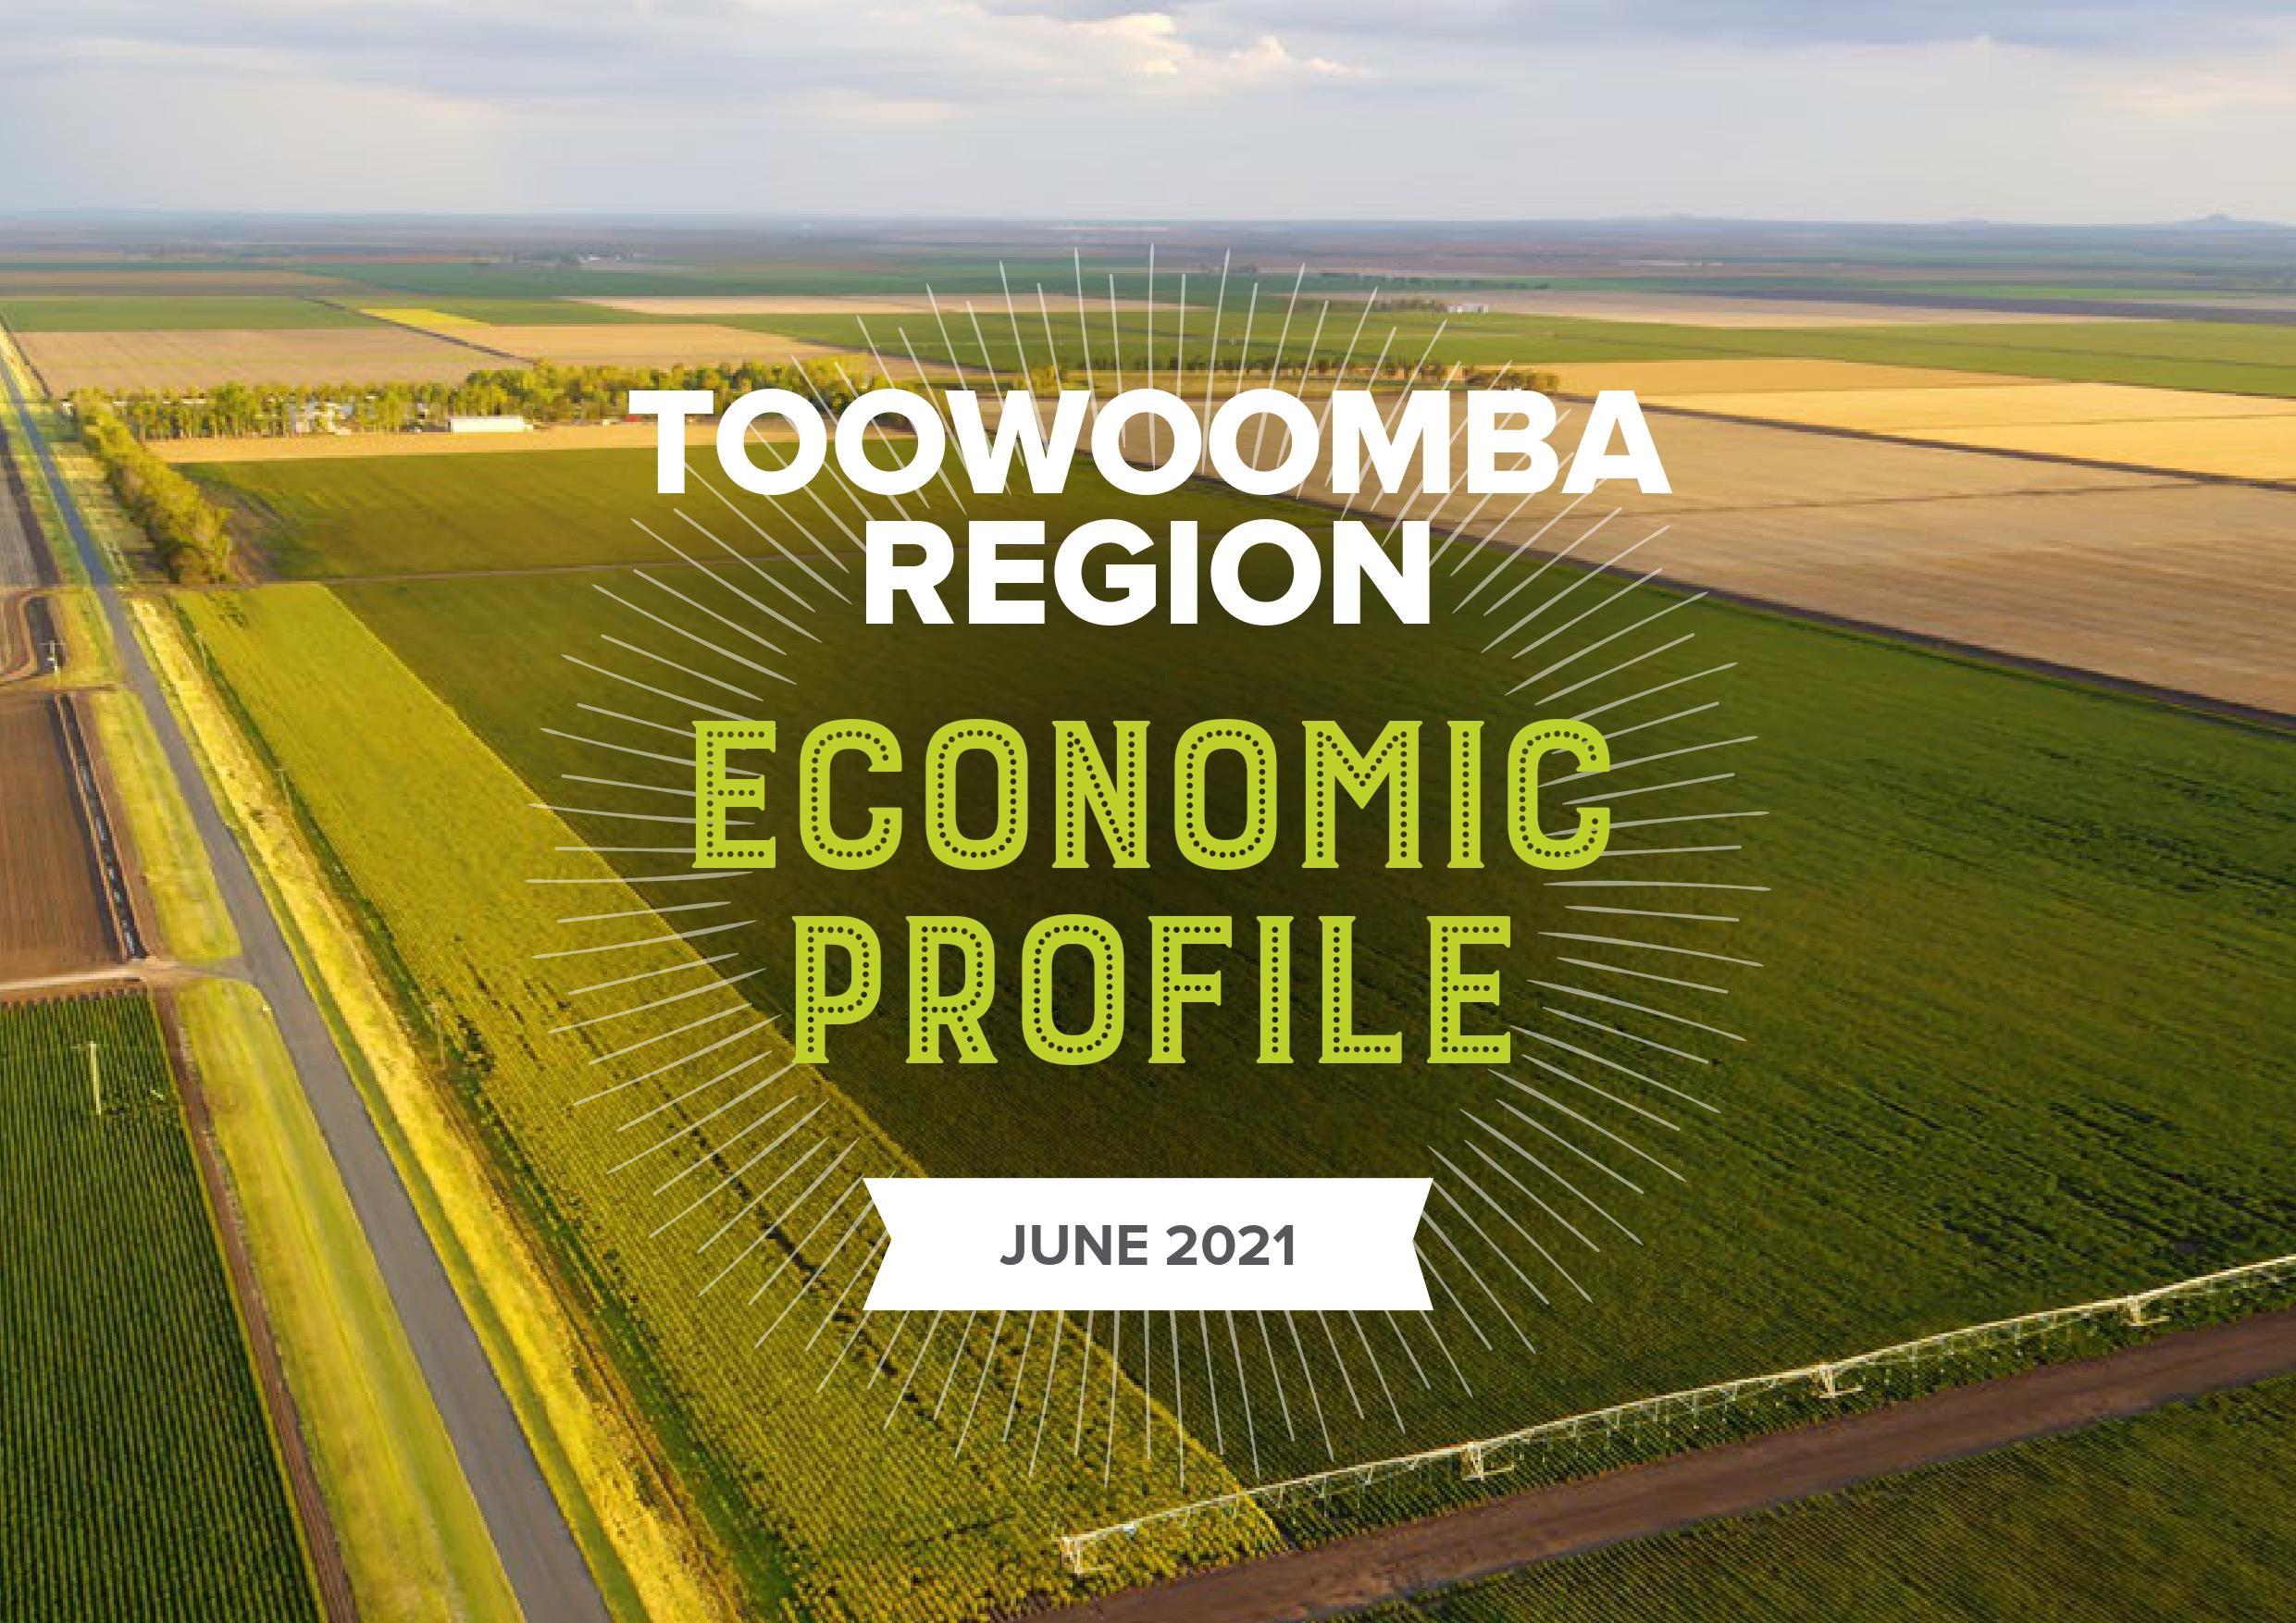 Toowoomba Region Economic Profile